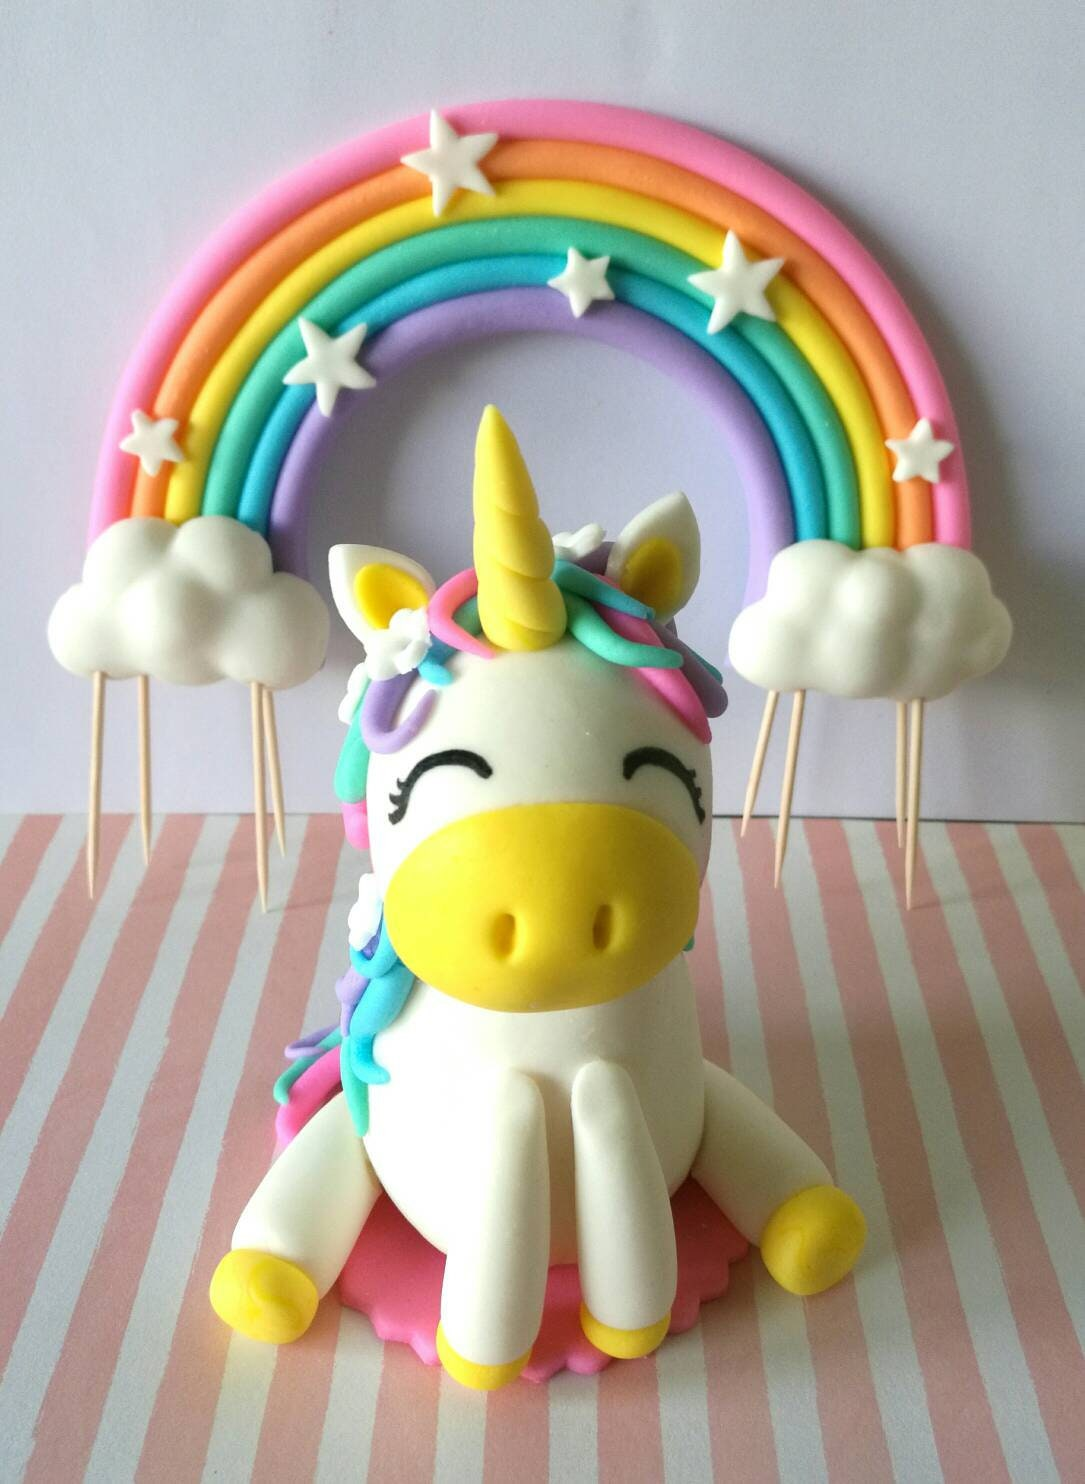 Unicorn Fondant Figure & Rainbow Cake Topper | Etsy